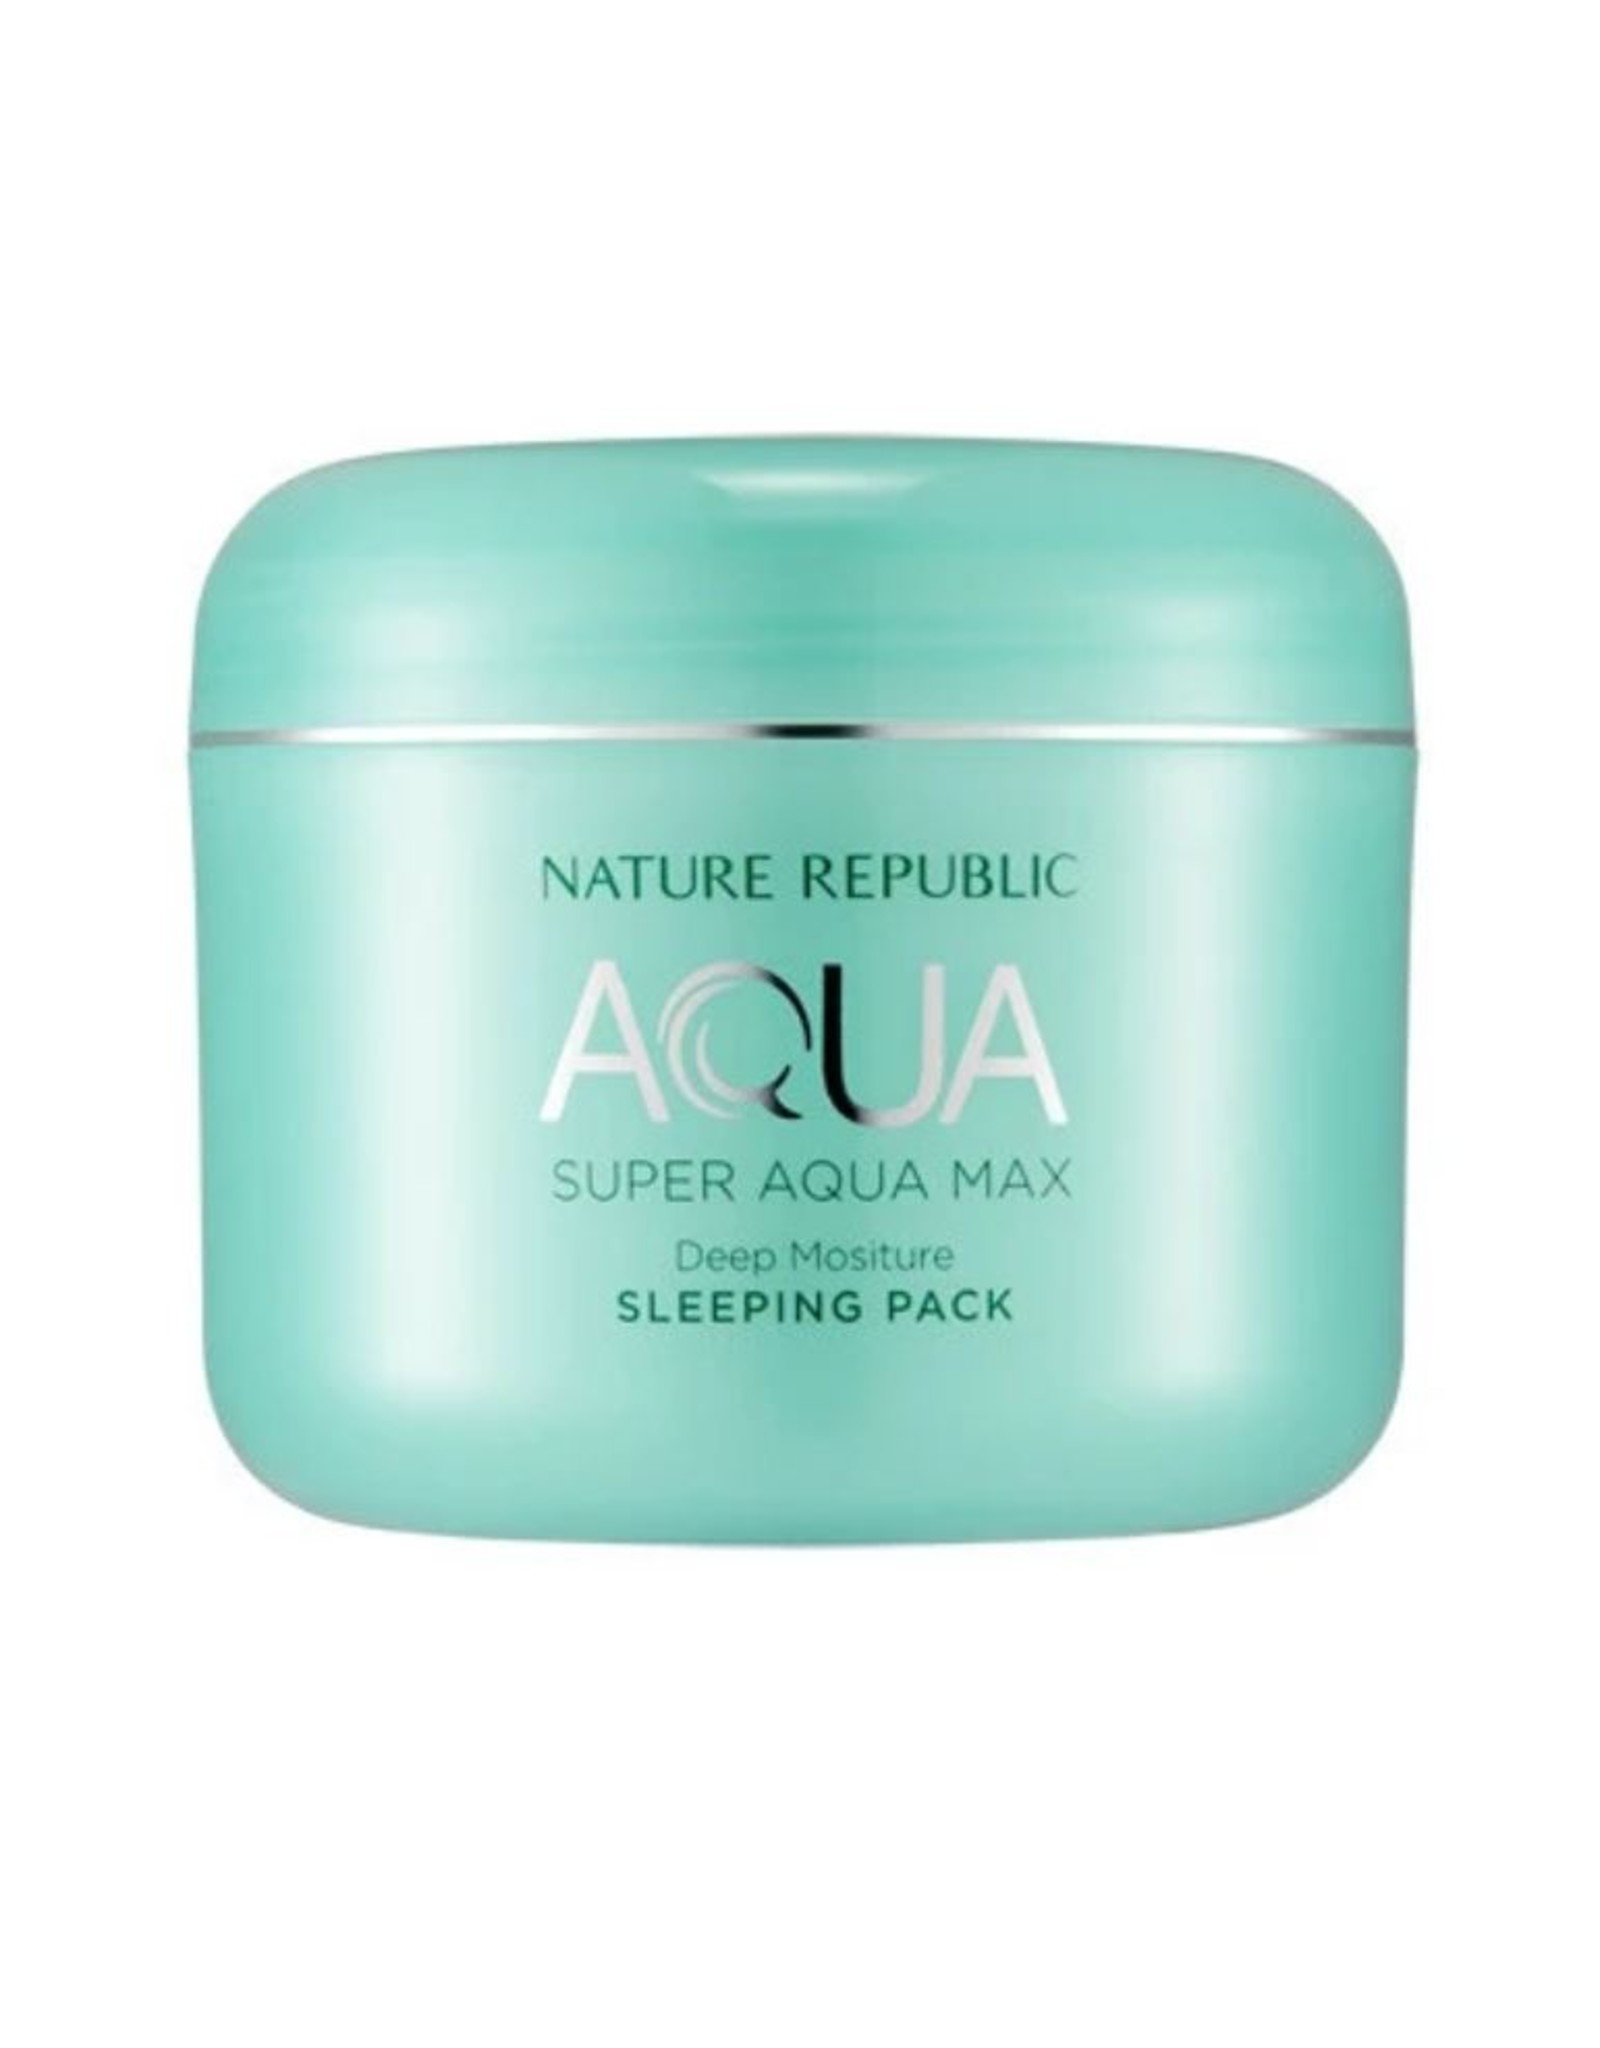 Super Aqua Max Deep Moisture Sleeping Pack